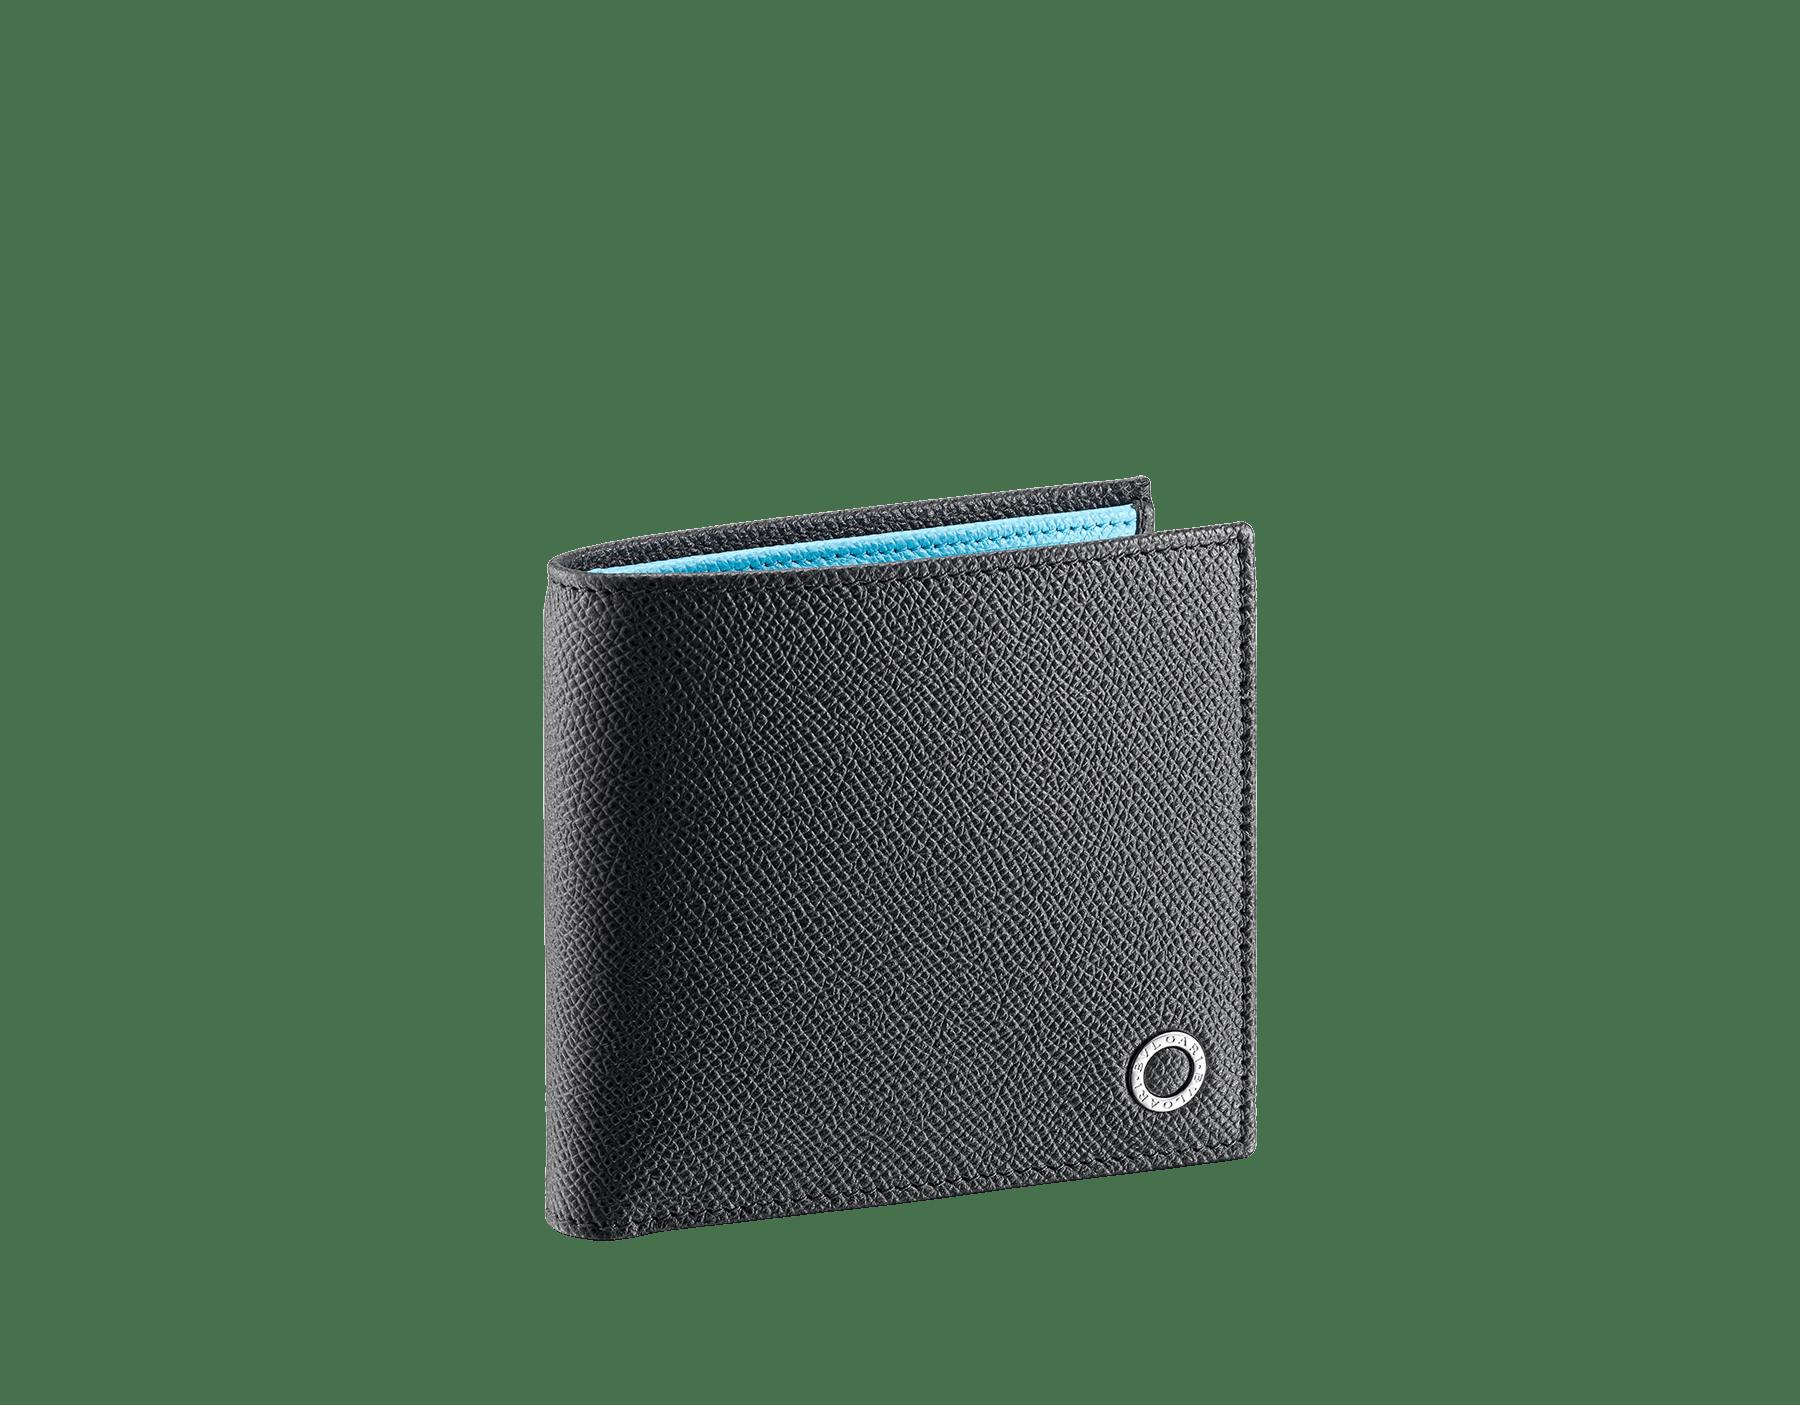 """BVLGARI BVLGARI"" compact wallet in Charcoal Diamond grey and light Aegean Topaz blue grained calfskin. Iconic logo-bearing embellishment in palladium-plated brass. 290587 image 1"